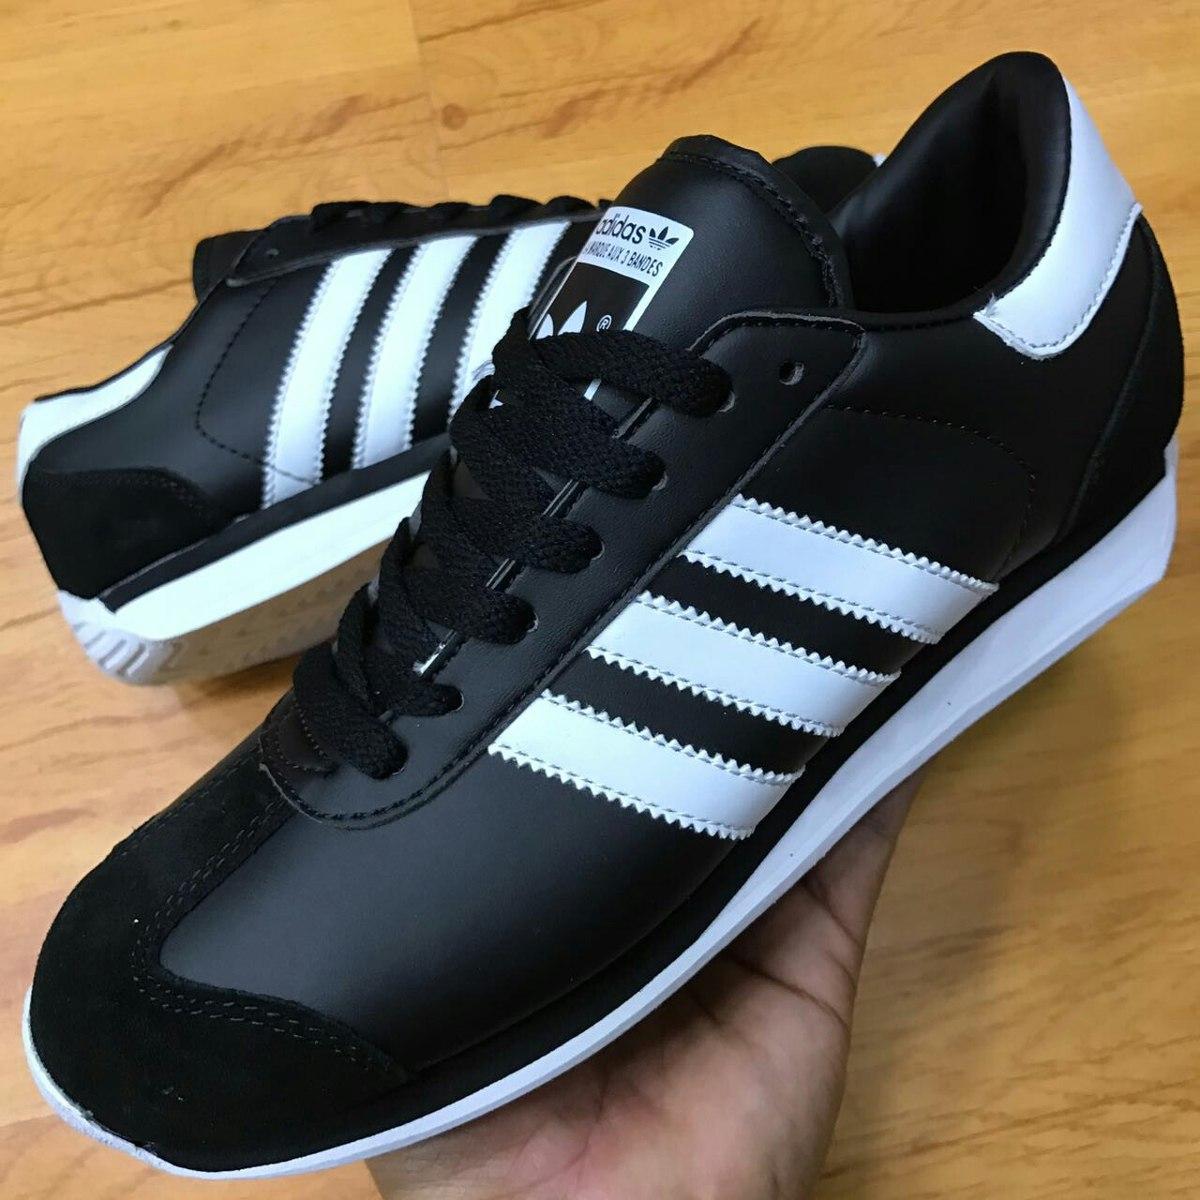 88f9dda8c tenis-adidas -country-clasicos-hombre-D NQ NP 662625-MCO25480953193 042017-F.jpg